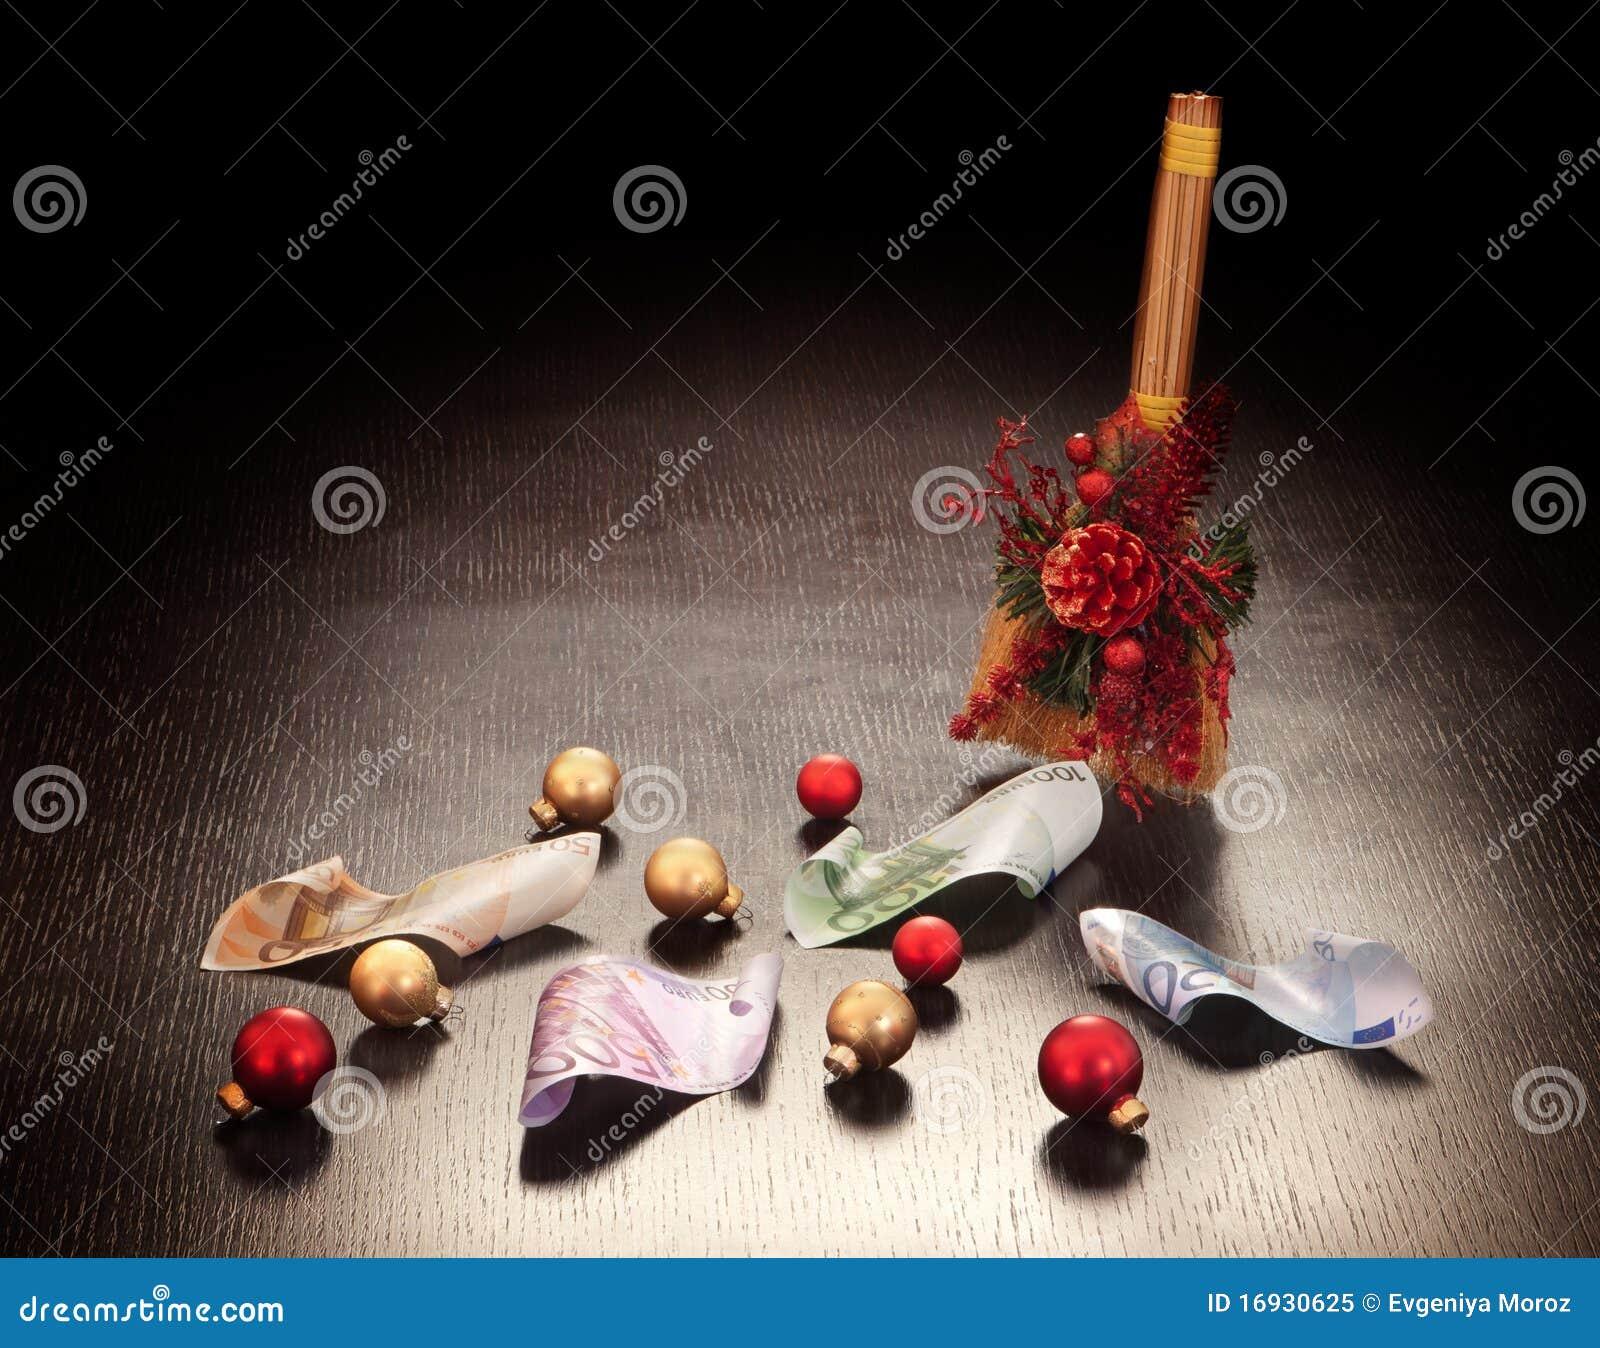 #A82326 Christmas Business Decoration: Euros Royalty Free Stock  6361 décoration noel commerce 1300x1112 px @ aertt.com